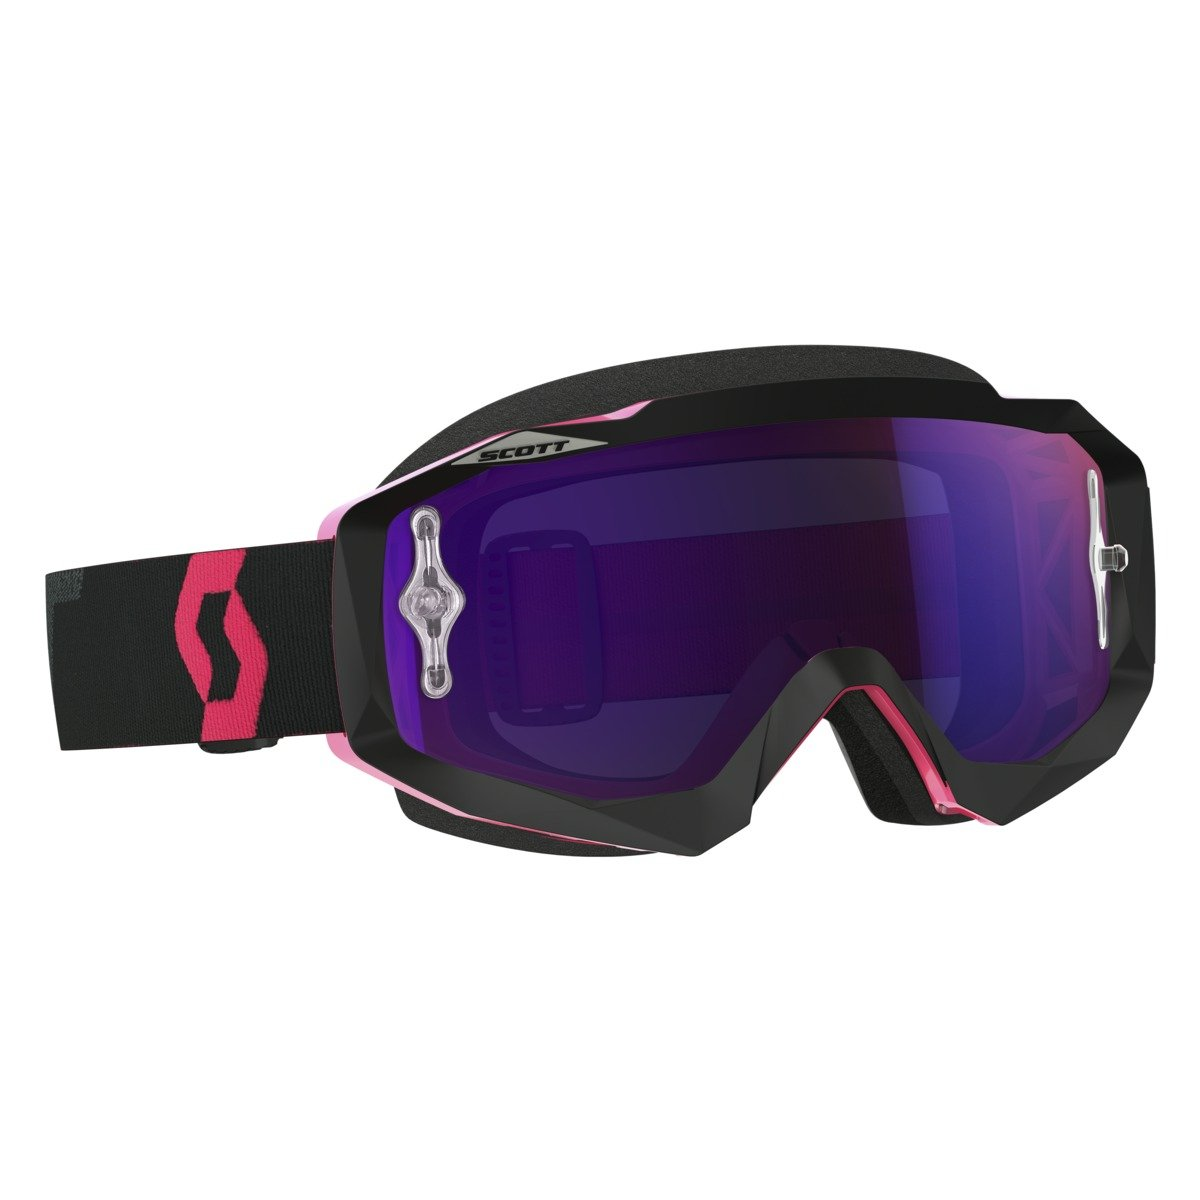 Scott Hustle Hustle Hustle Enduro MX Goggle Cross MTB Brille B01IVWXACS Brillen Für Ihre Wahl 46ad40